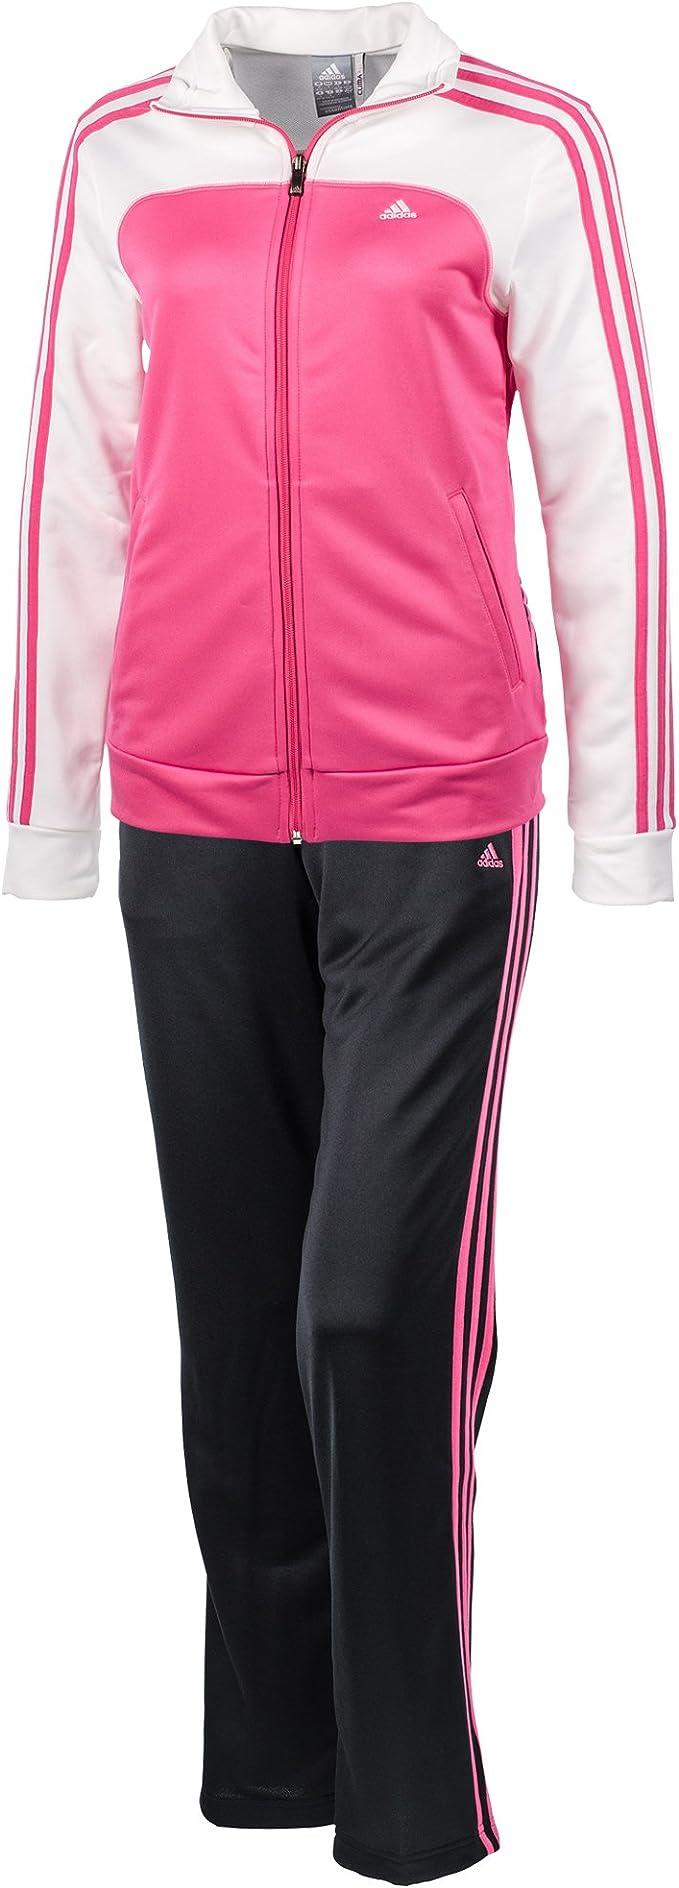 Adidas Trainingsanzug Essentials 3-Stripes Knit Suit - Chándal ...